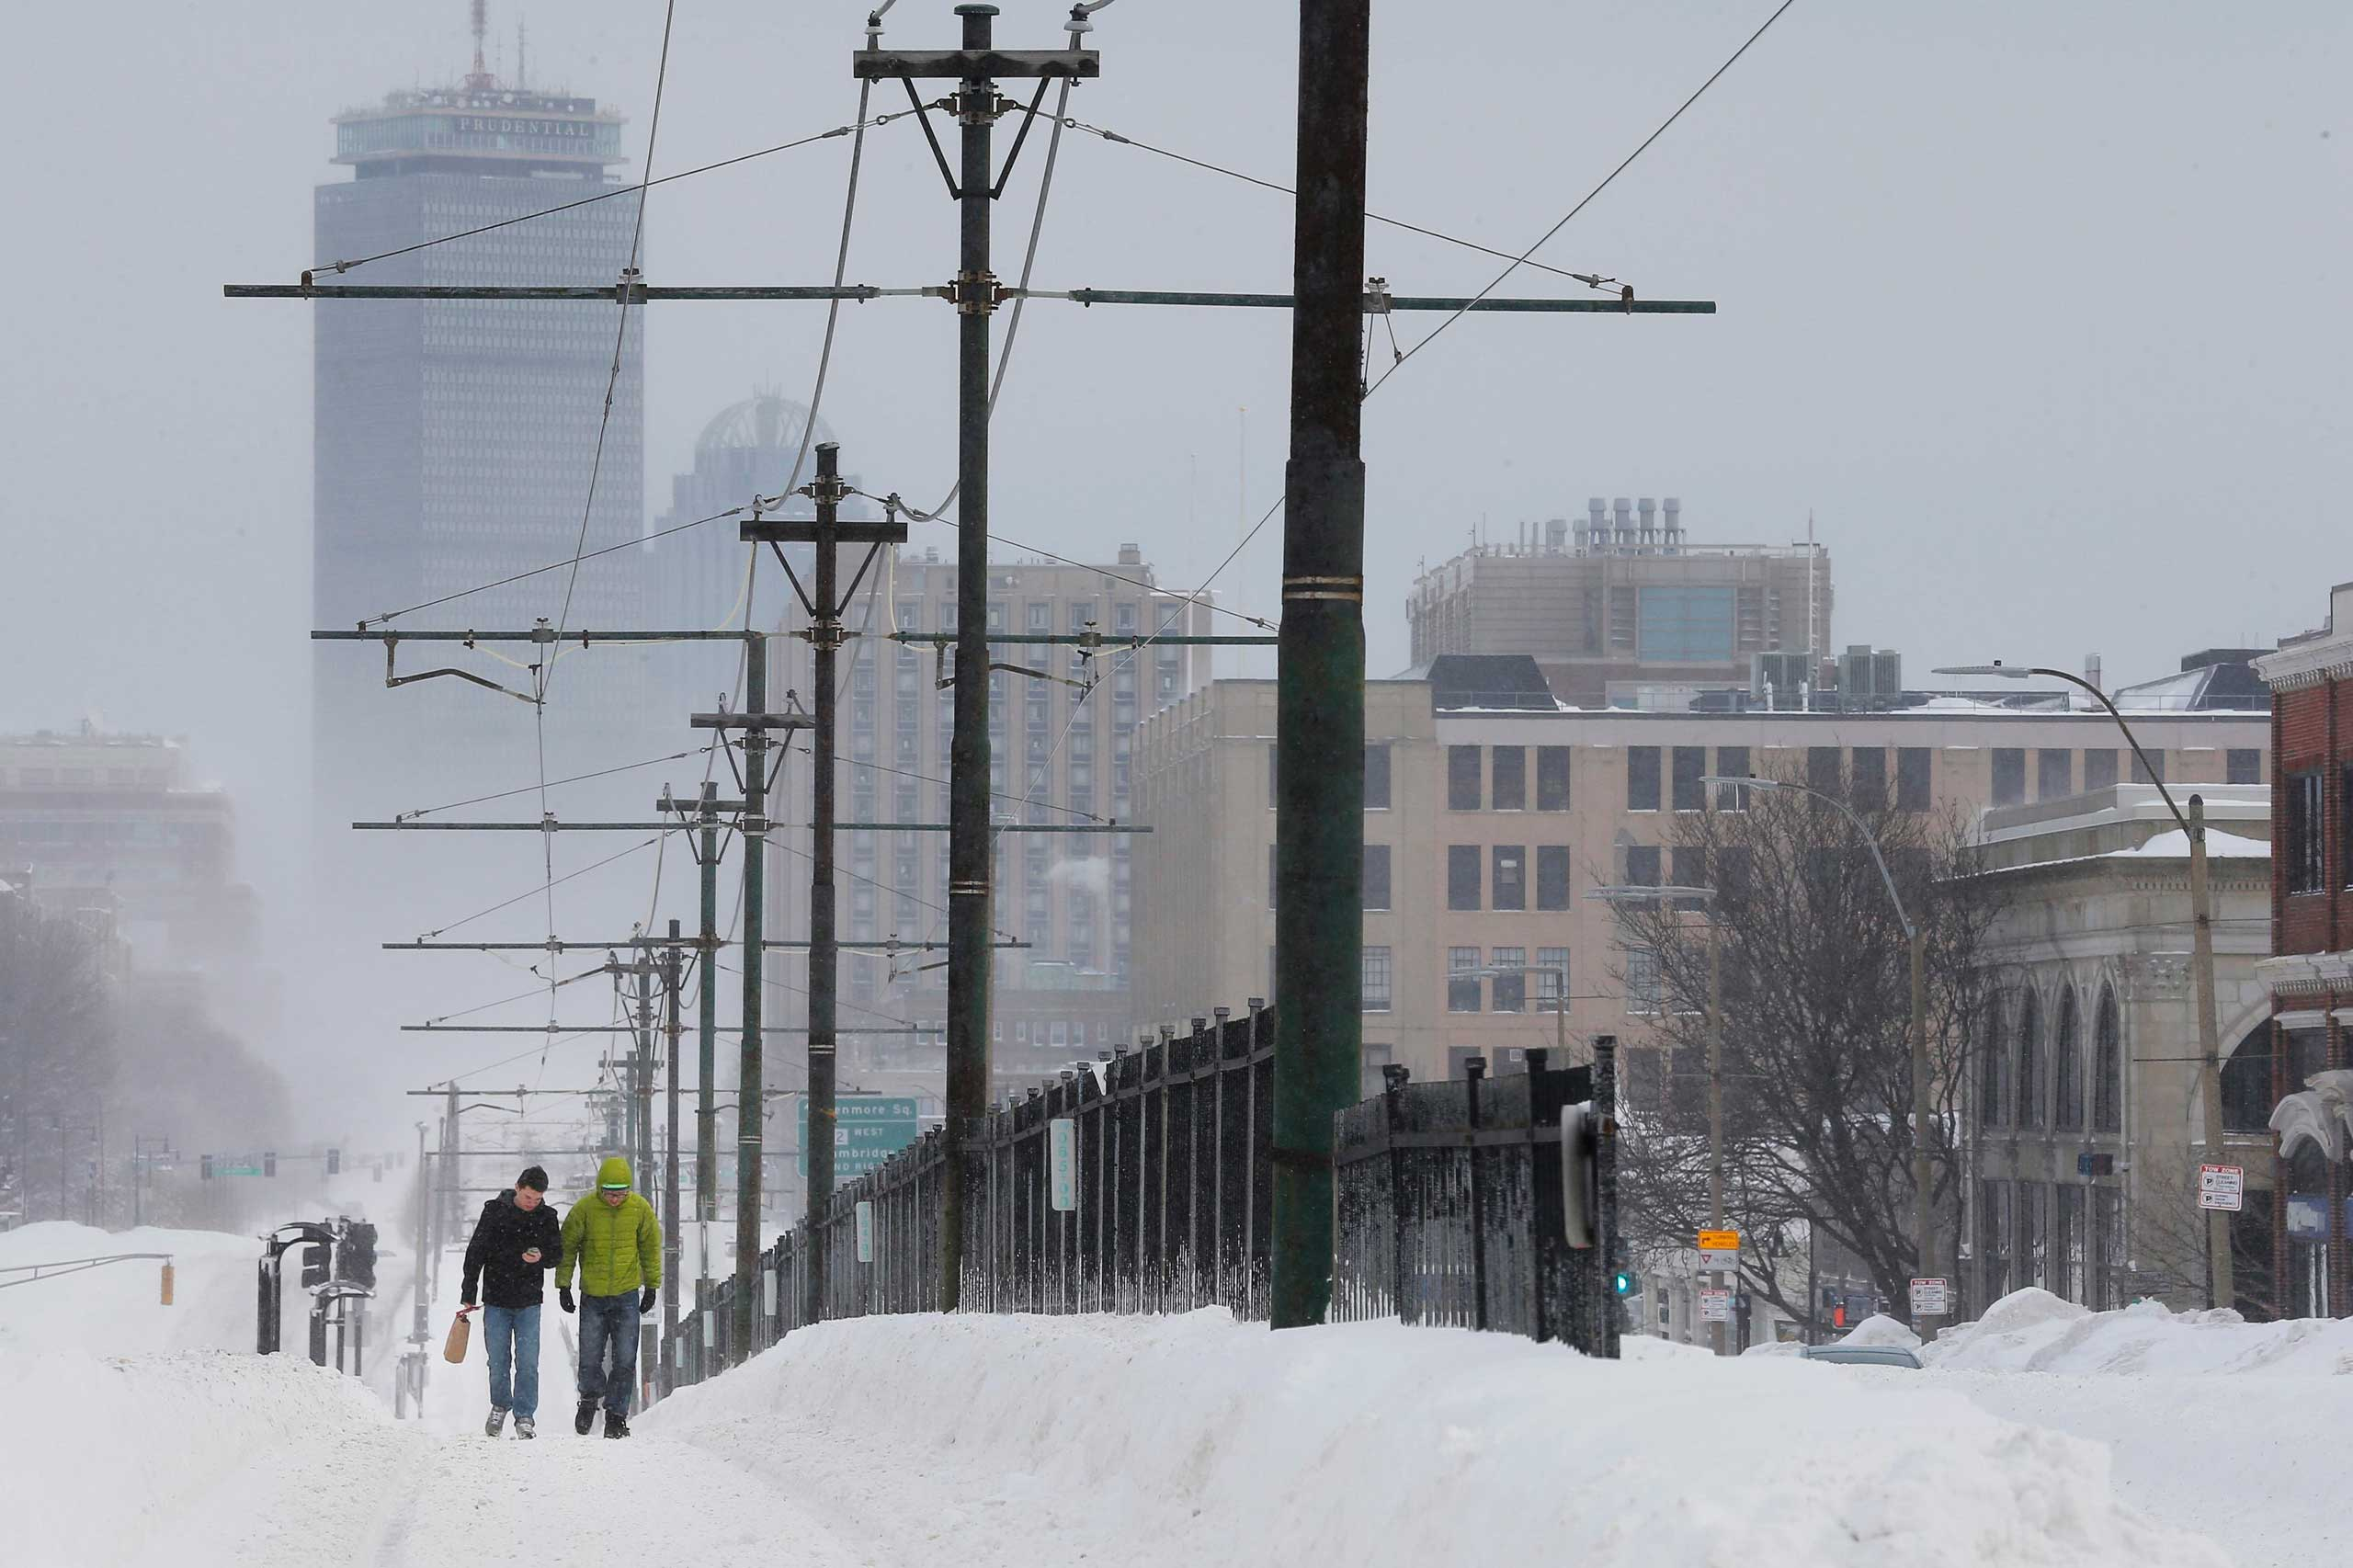 Pedestrians walk along snow covered, MBTA subway rails on Commonwealth Avenue in Boston, Massachusetts following a winter storm on Feb. 15, 2015.